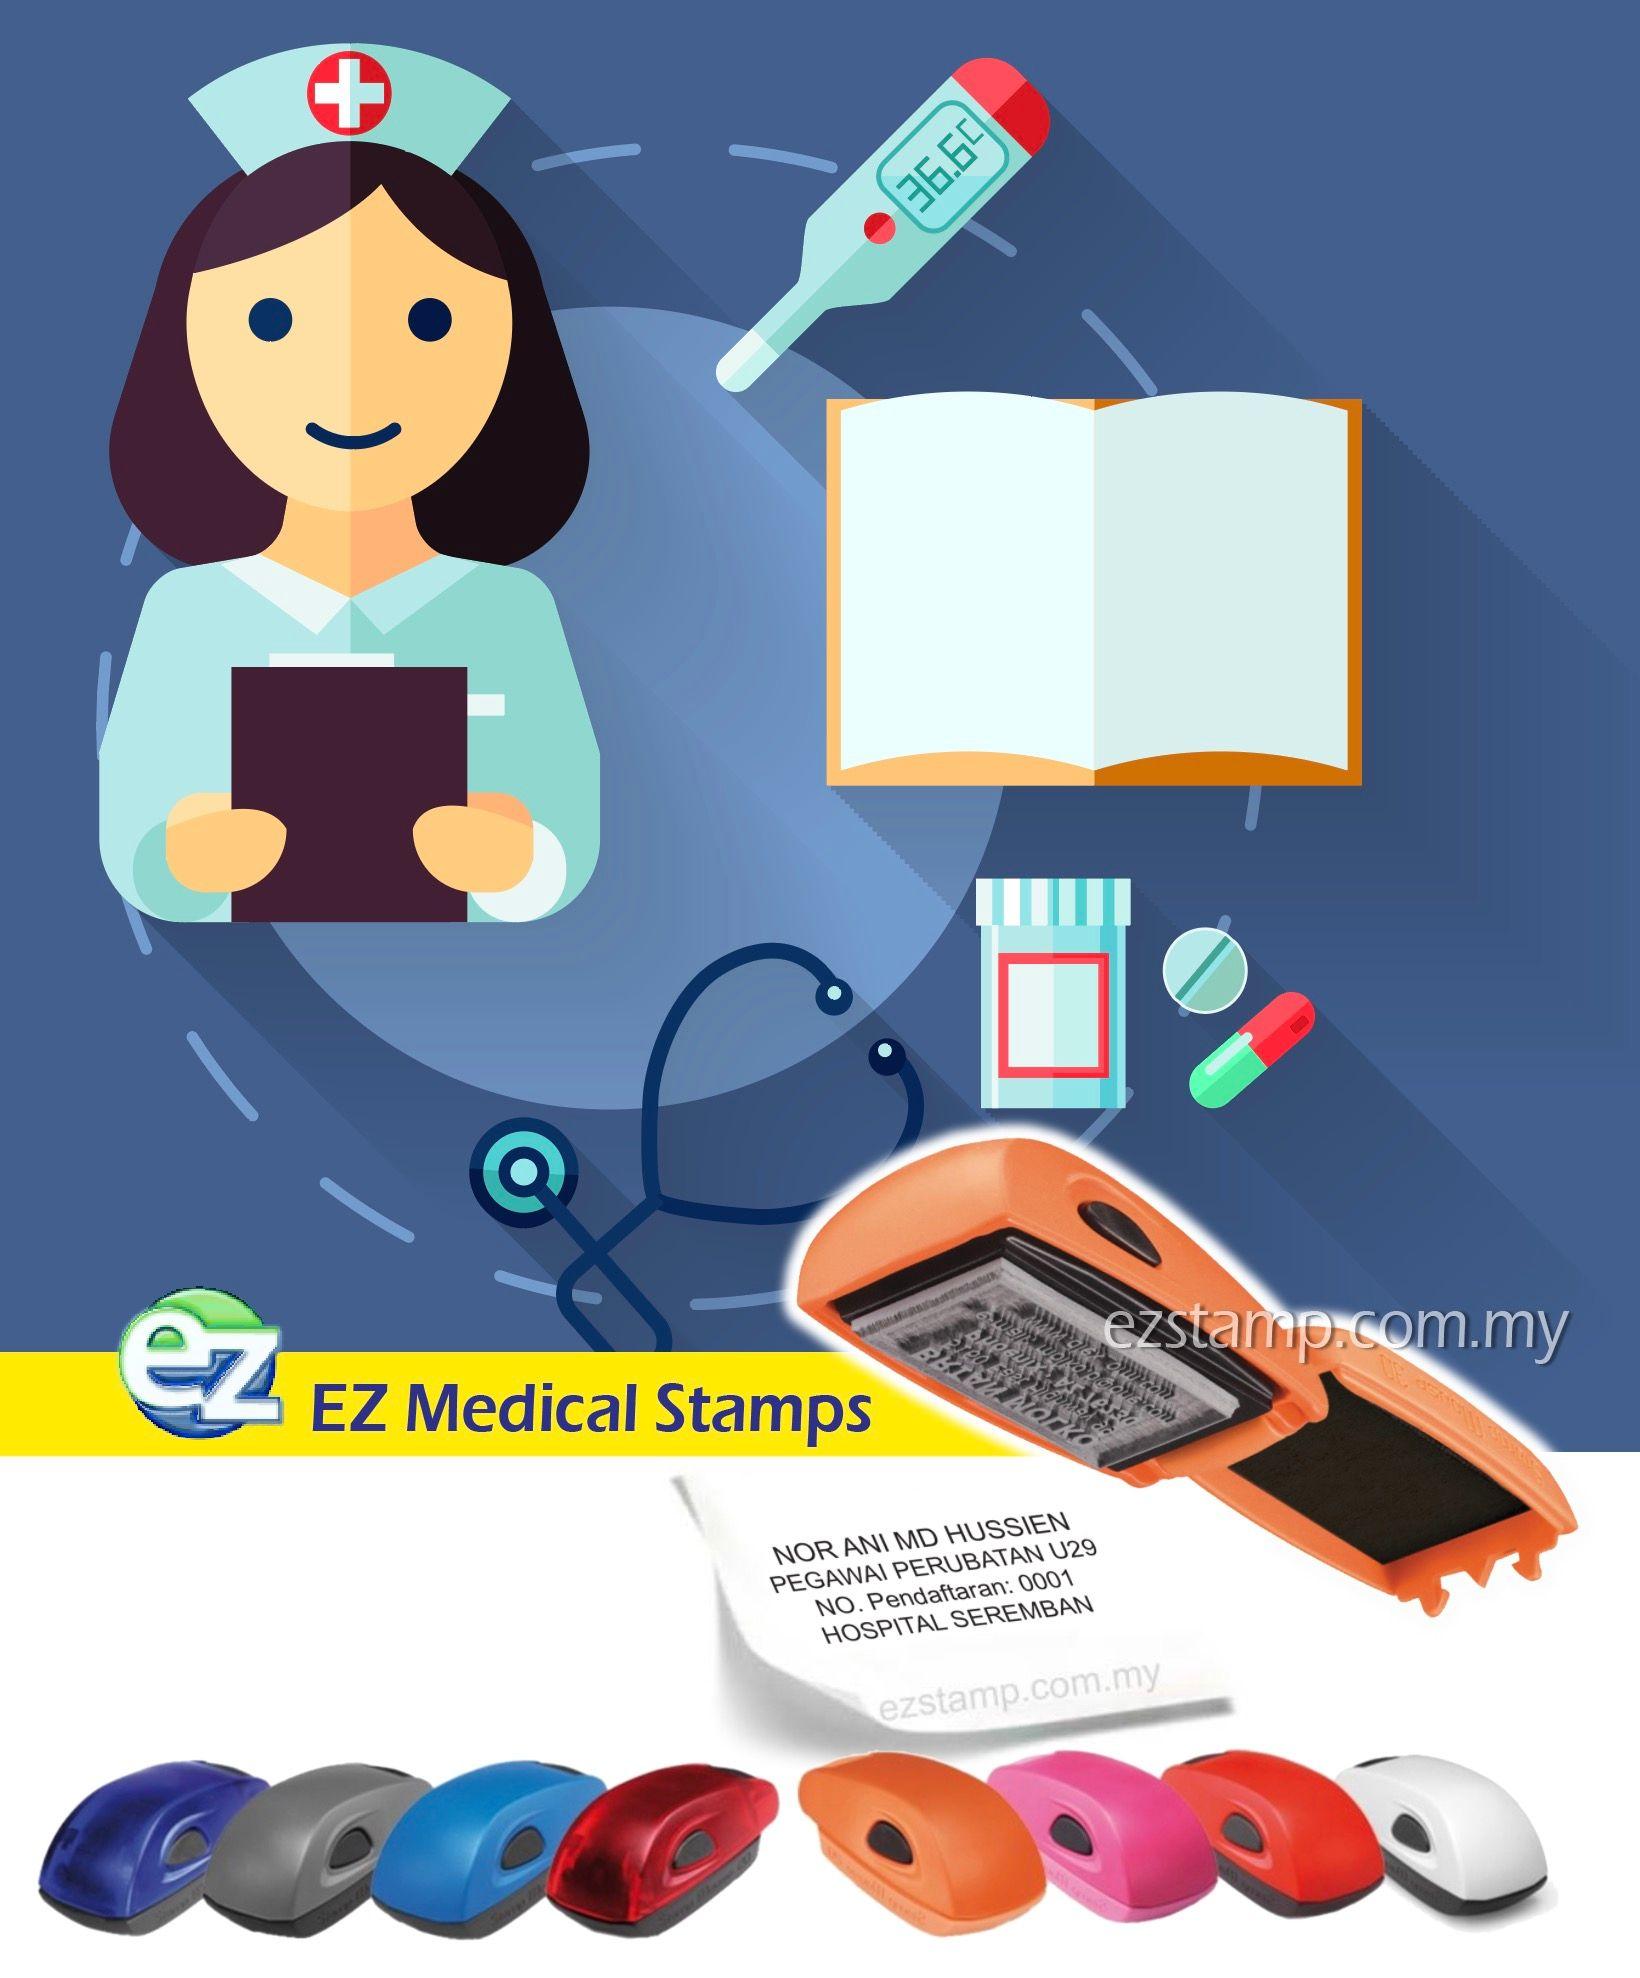 Ez Mouse Stamp Utk Pegawai Perubatan Nurses Doctor Di Malaysia Kami Ada Pelbagai Model Design Utk Dipilih Sila Klik Li Hospital Self Inking Stamps Nurse